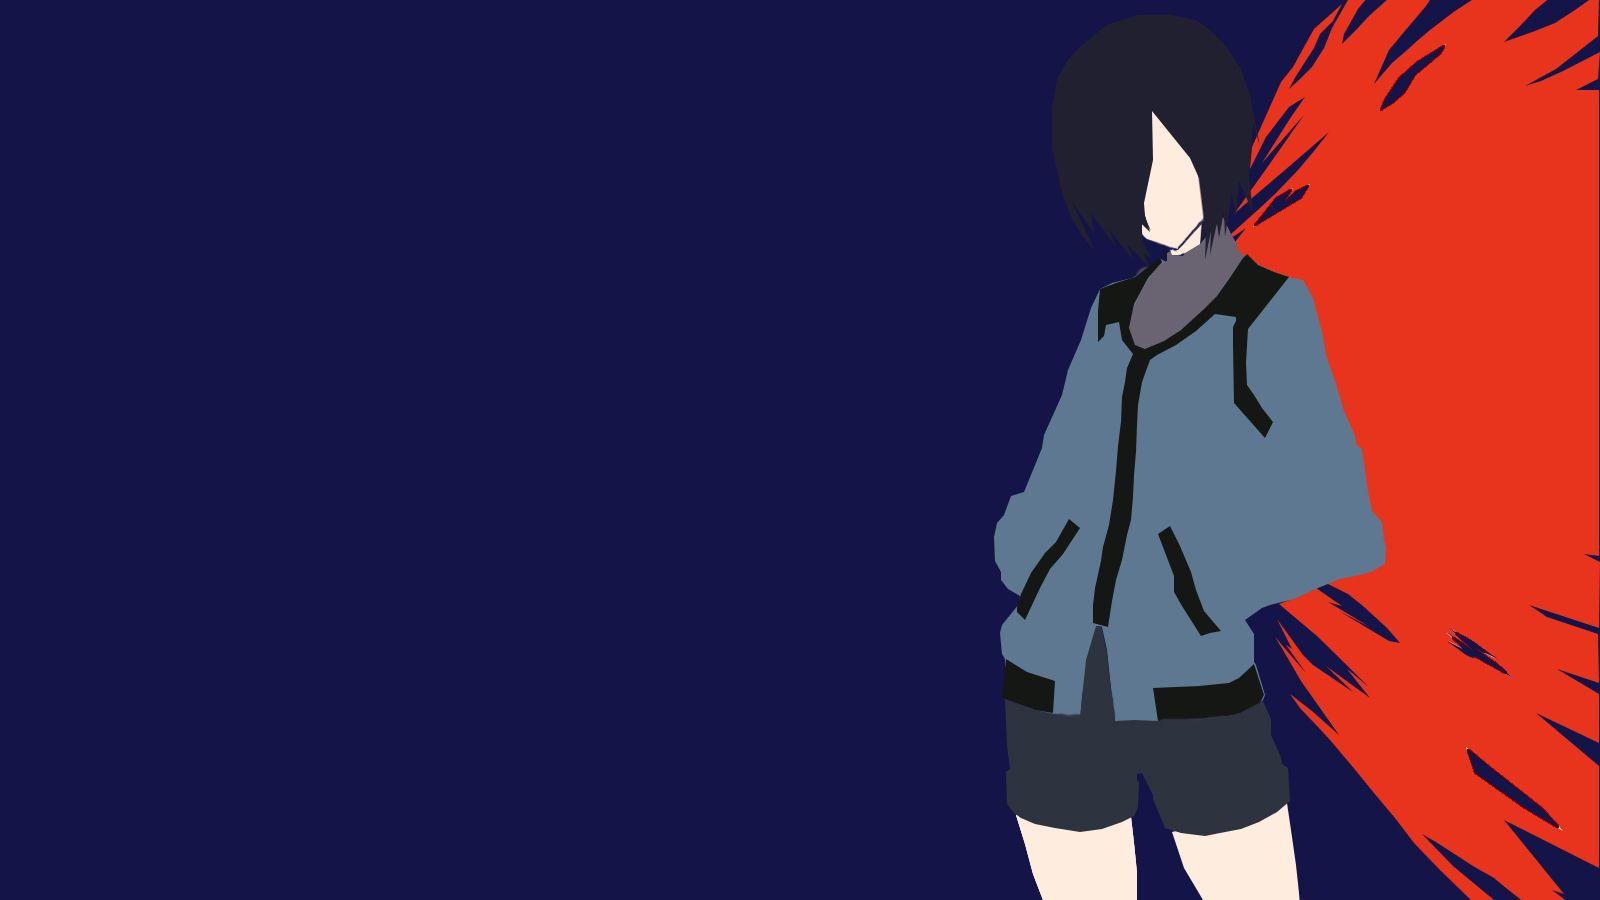 Kumpulan Wallpaper Minimalist Anime | wallpaper ubin